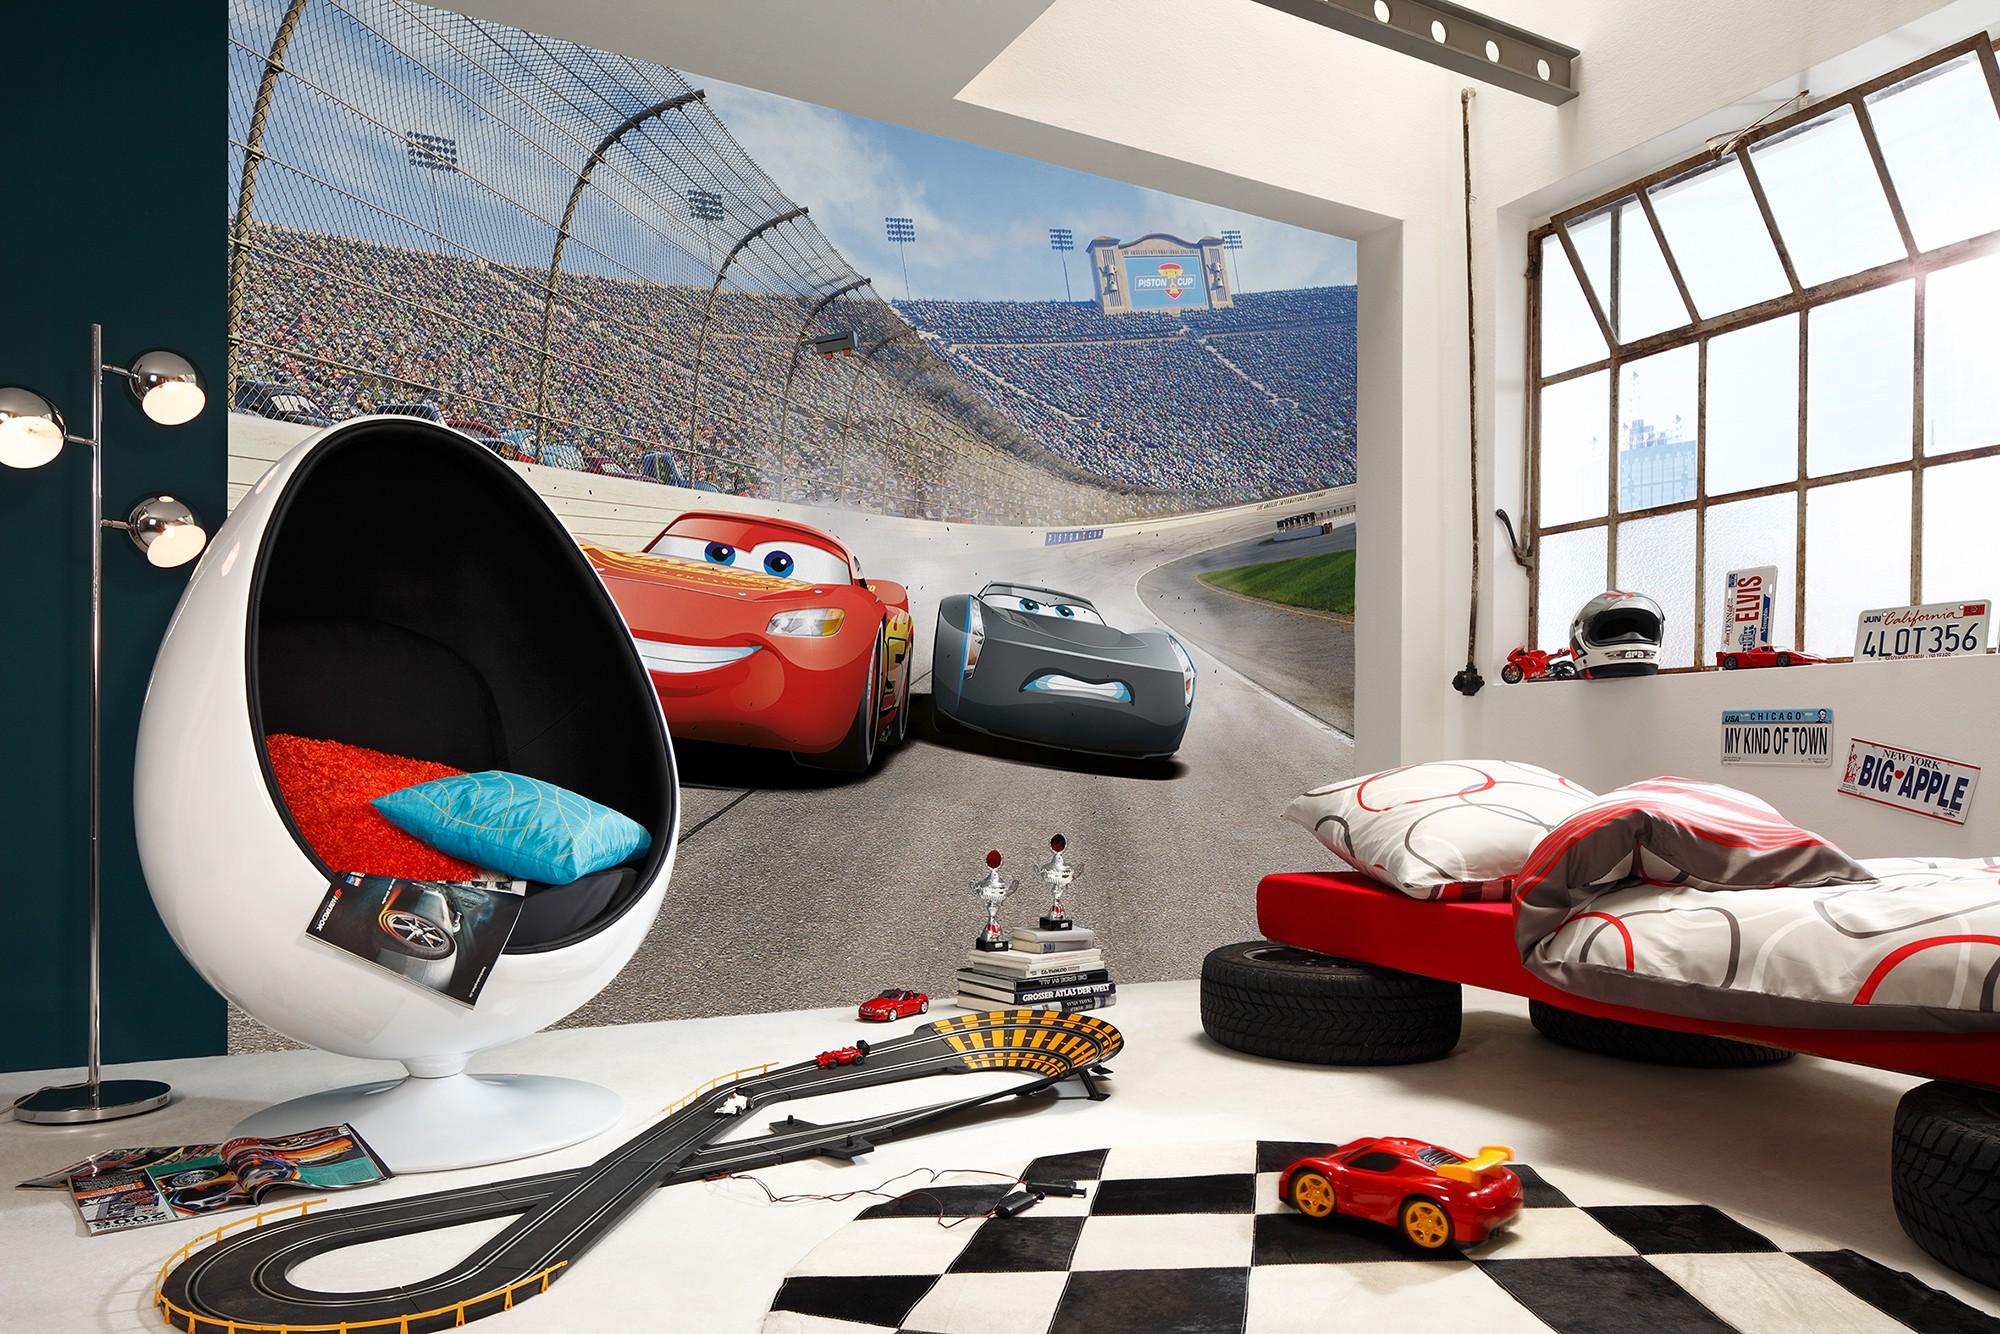 Mural Cars3 Curve 8-403